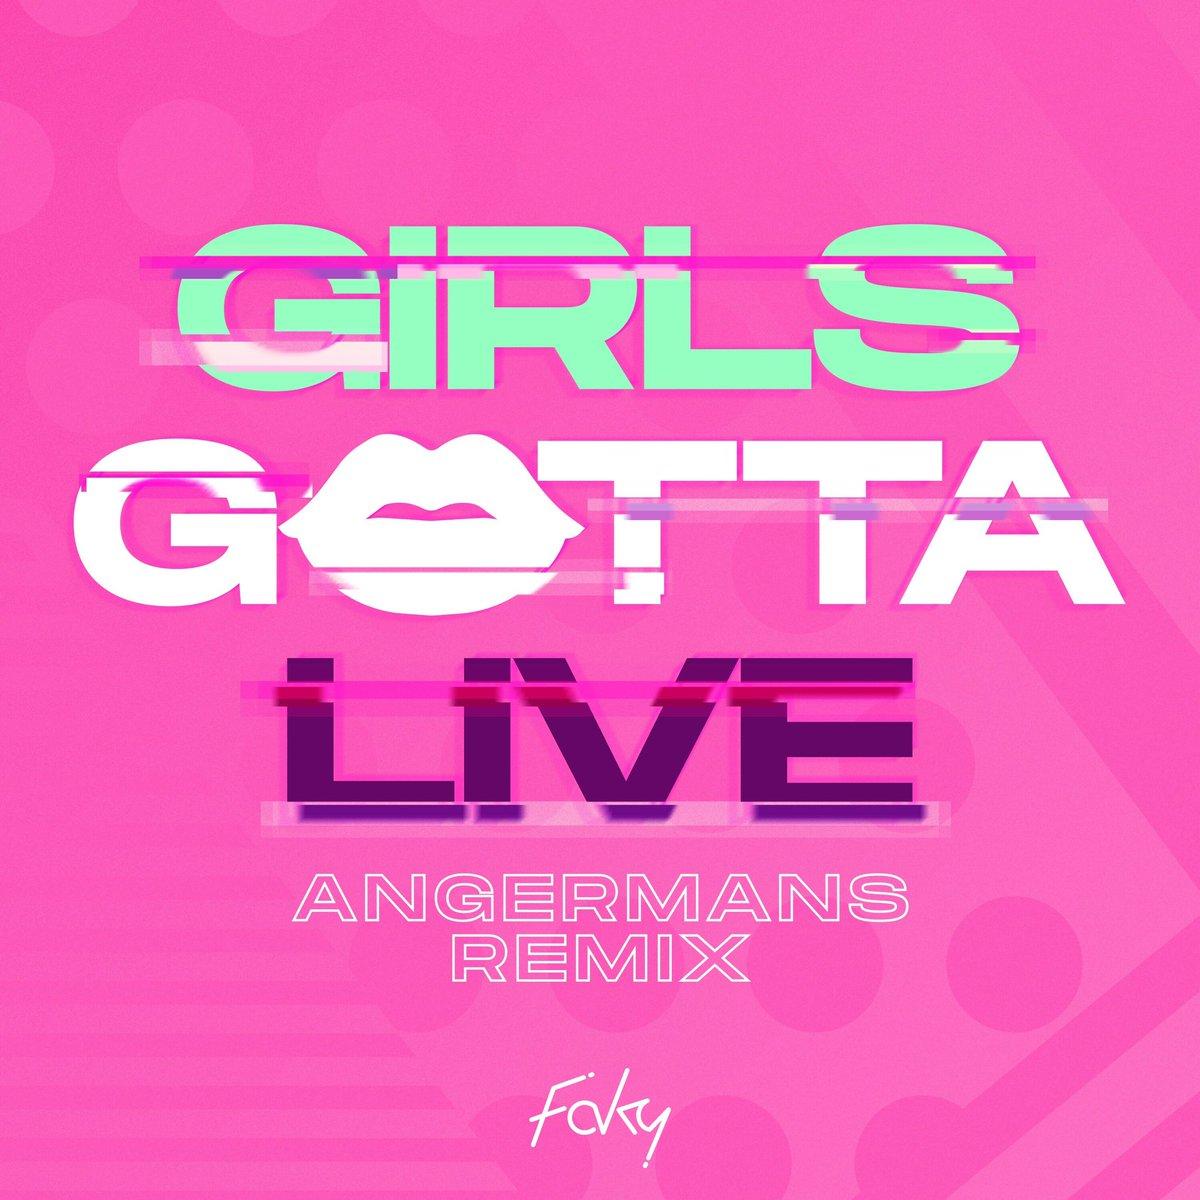 【 GIRLS GOTTA LIVE リミックス配信スタート💄📸】FAKYDigital Single「GIRLS GOTTA LIVE -ANGERMANS Remix-」▼StreamingSpotify:Apple Music:LINE MUSIC:AWA:#GGLR